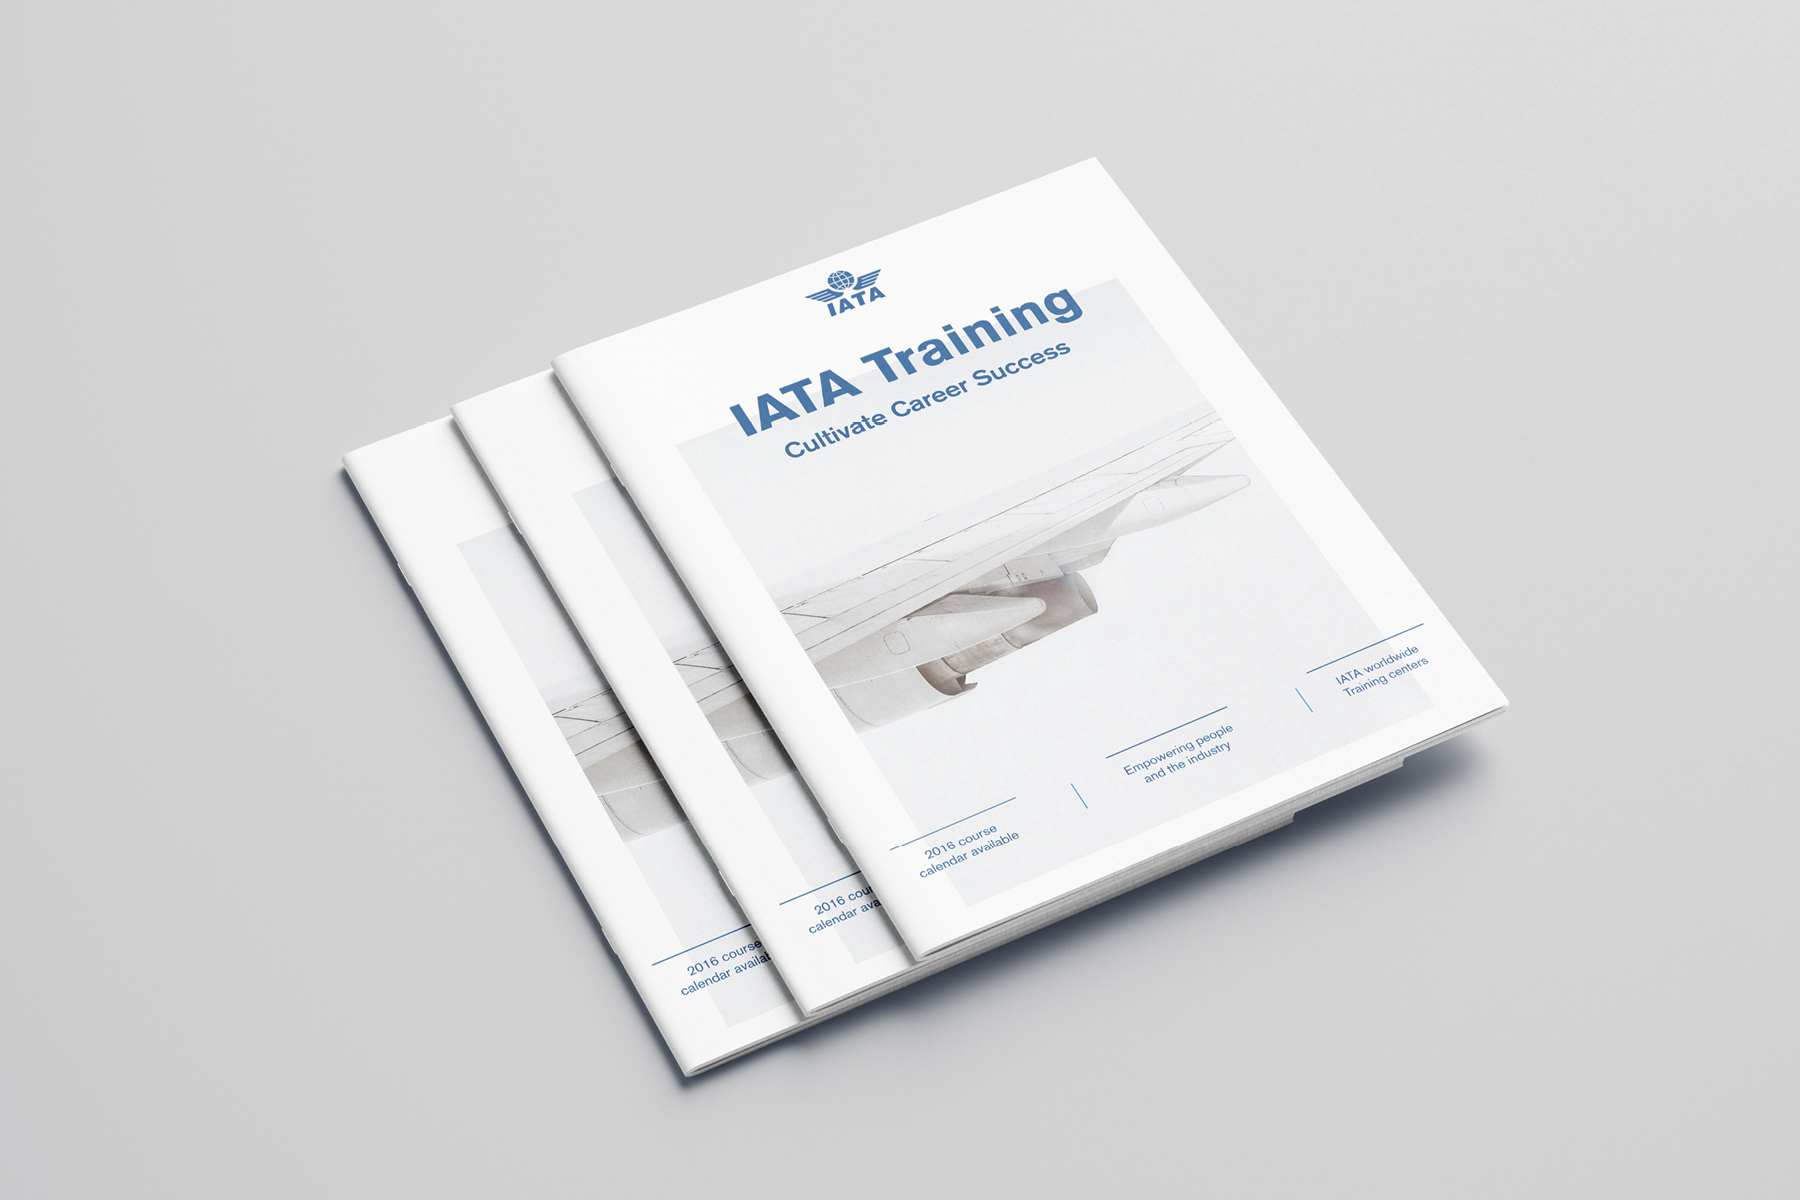 atelieratoca_IATA7